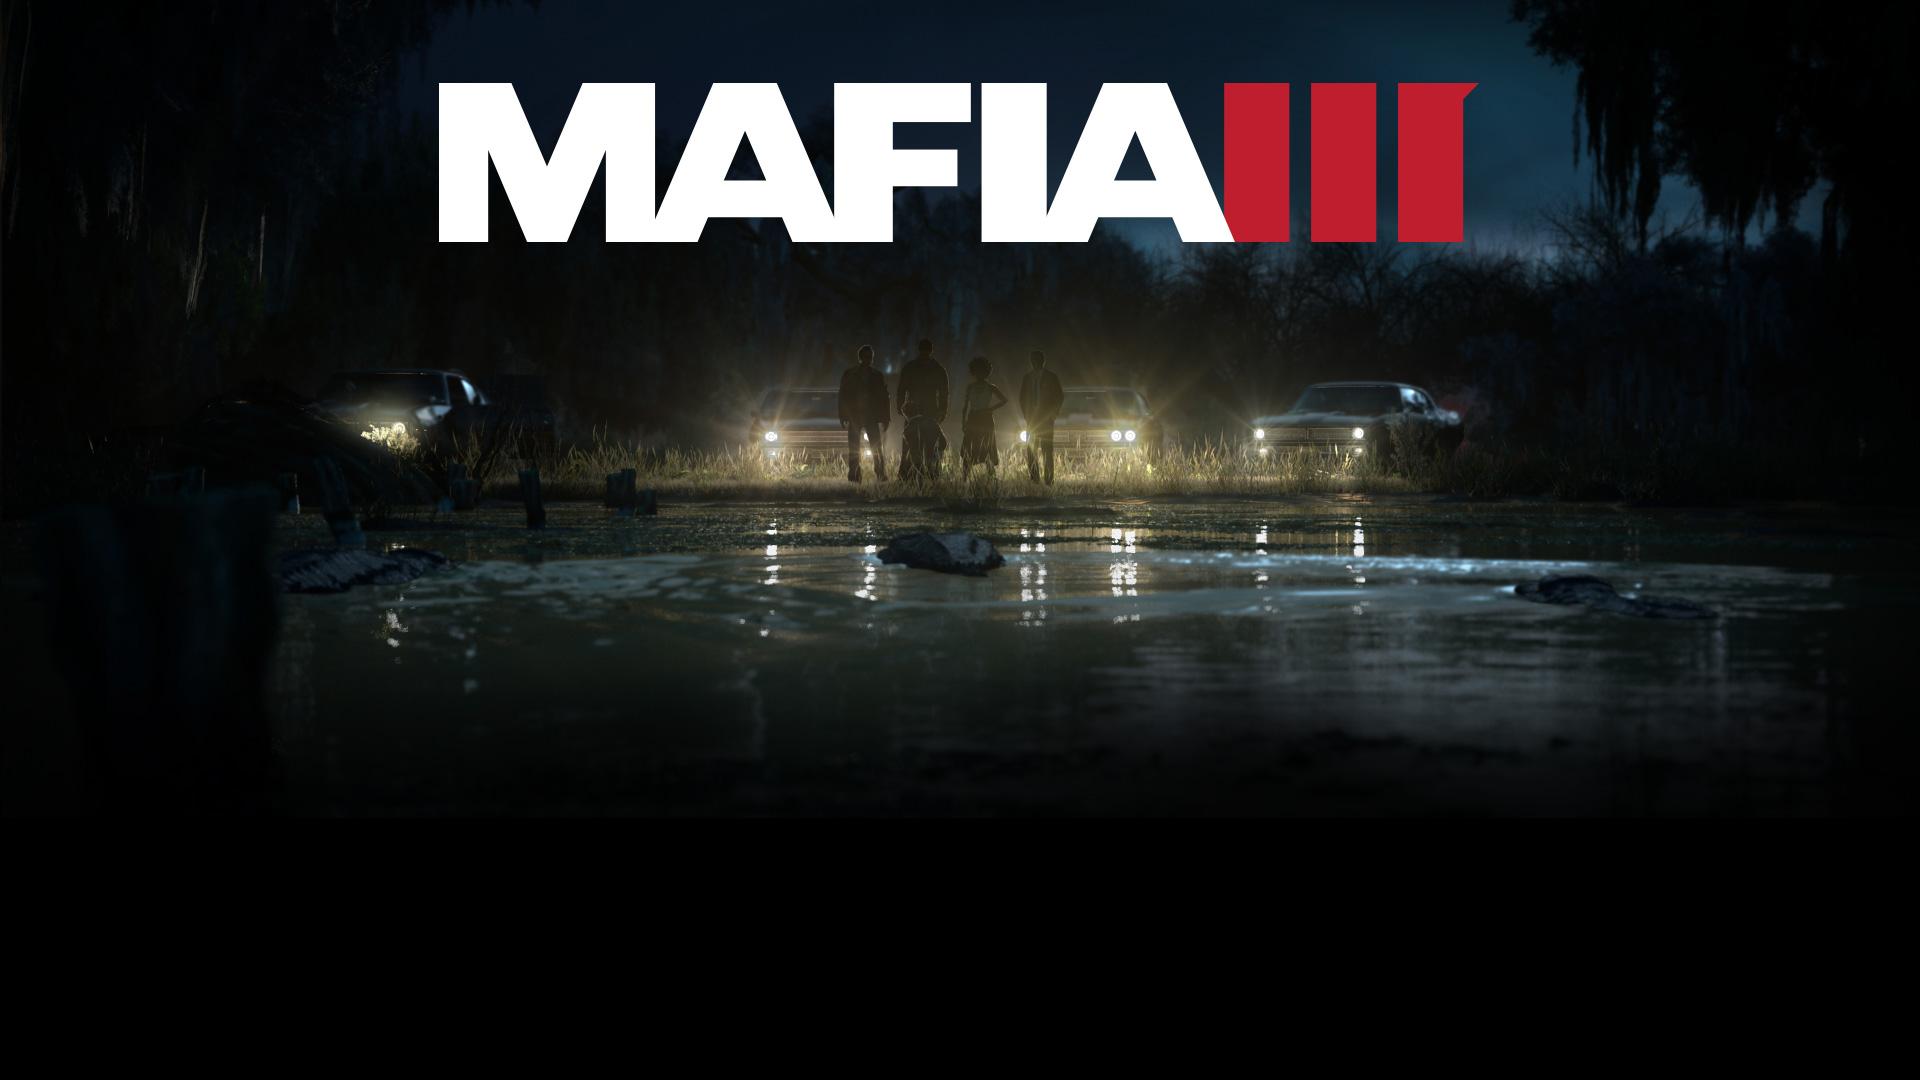 Mafia Iii Fondo De Pantalla Hd Fondo De Escritorio